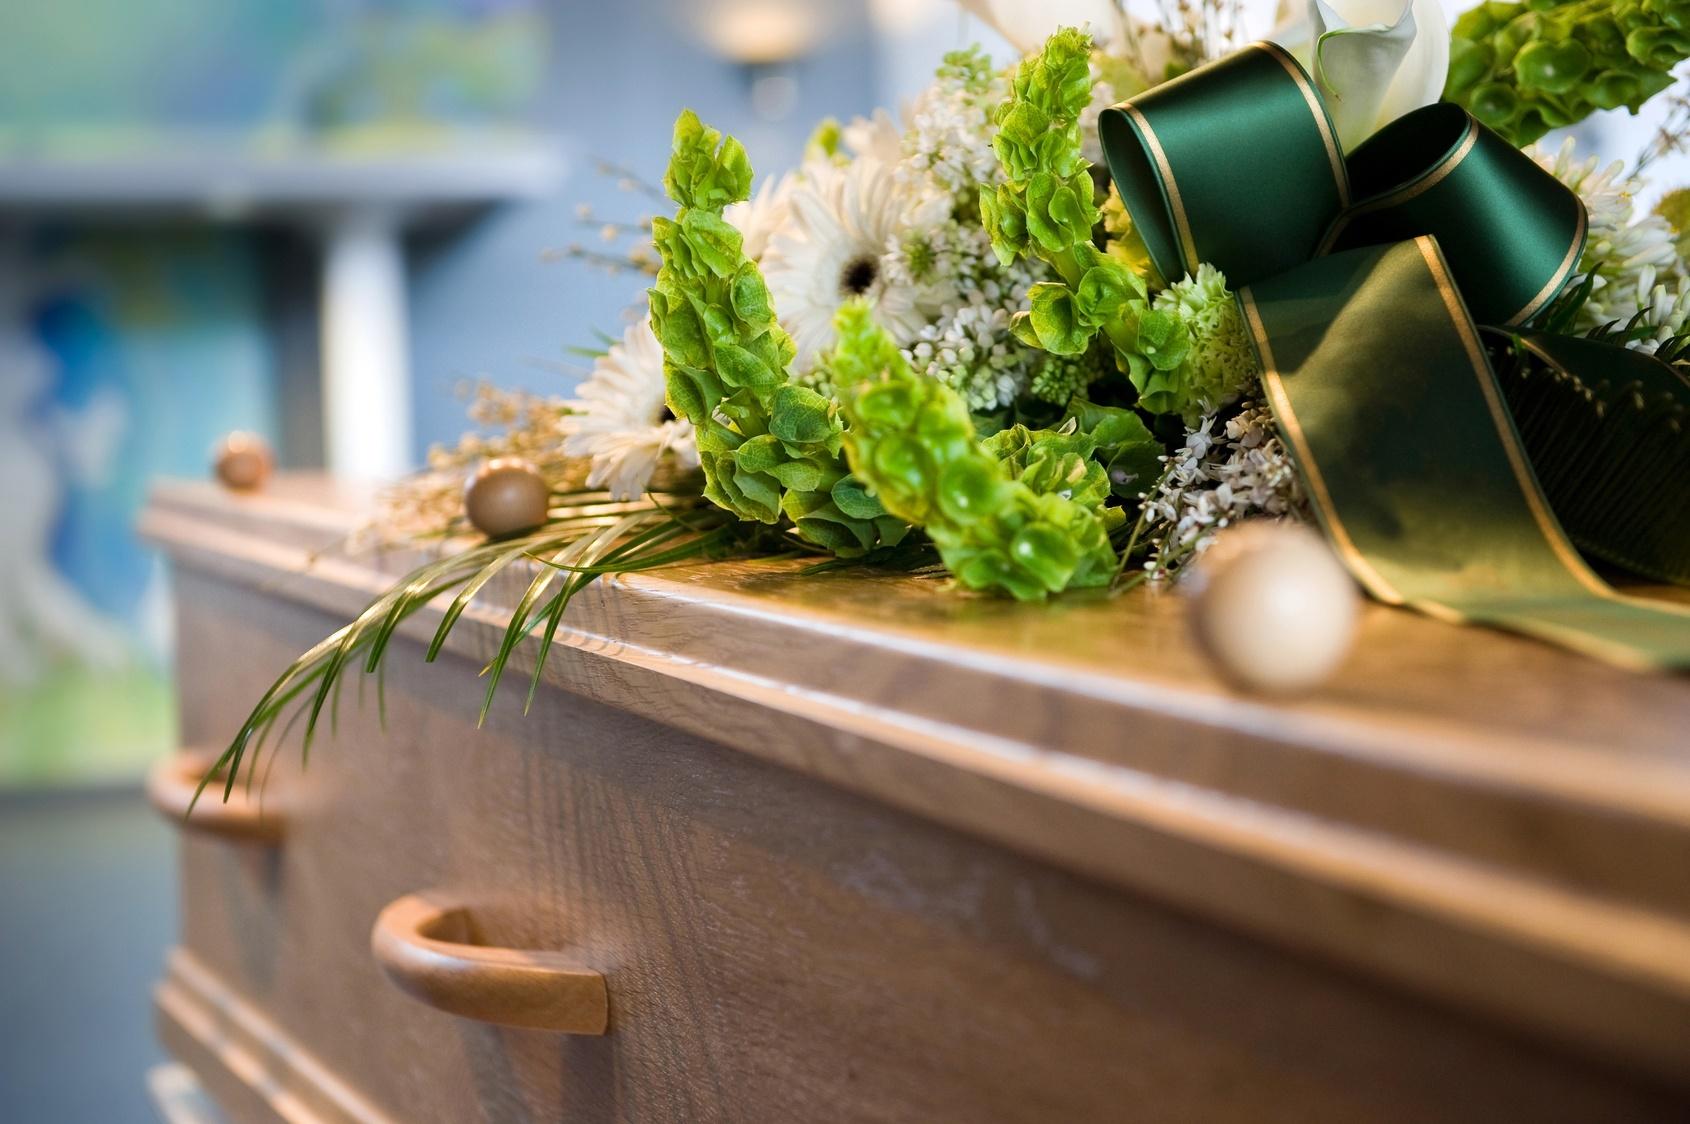 Pre-arranged funeral